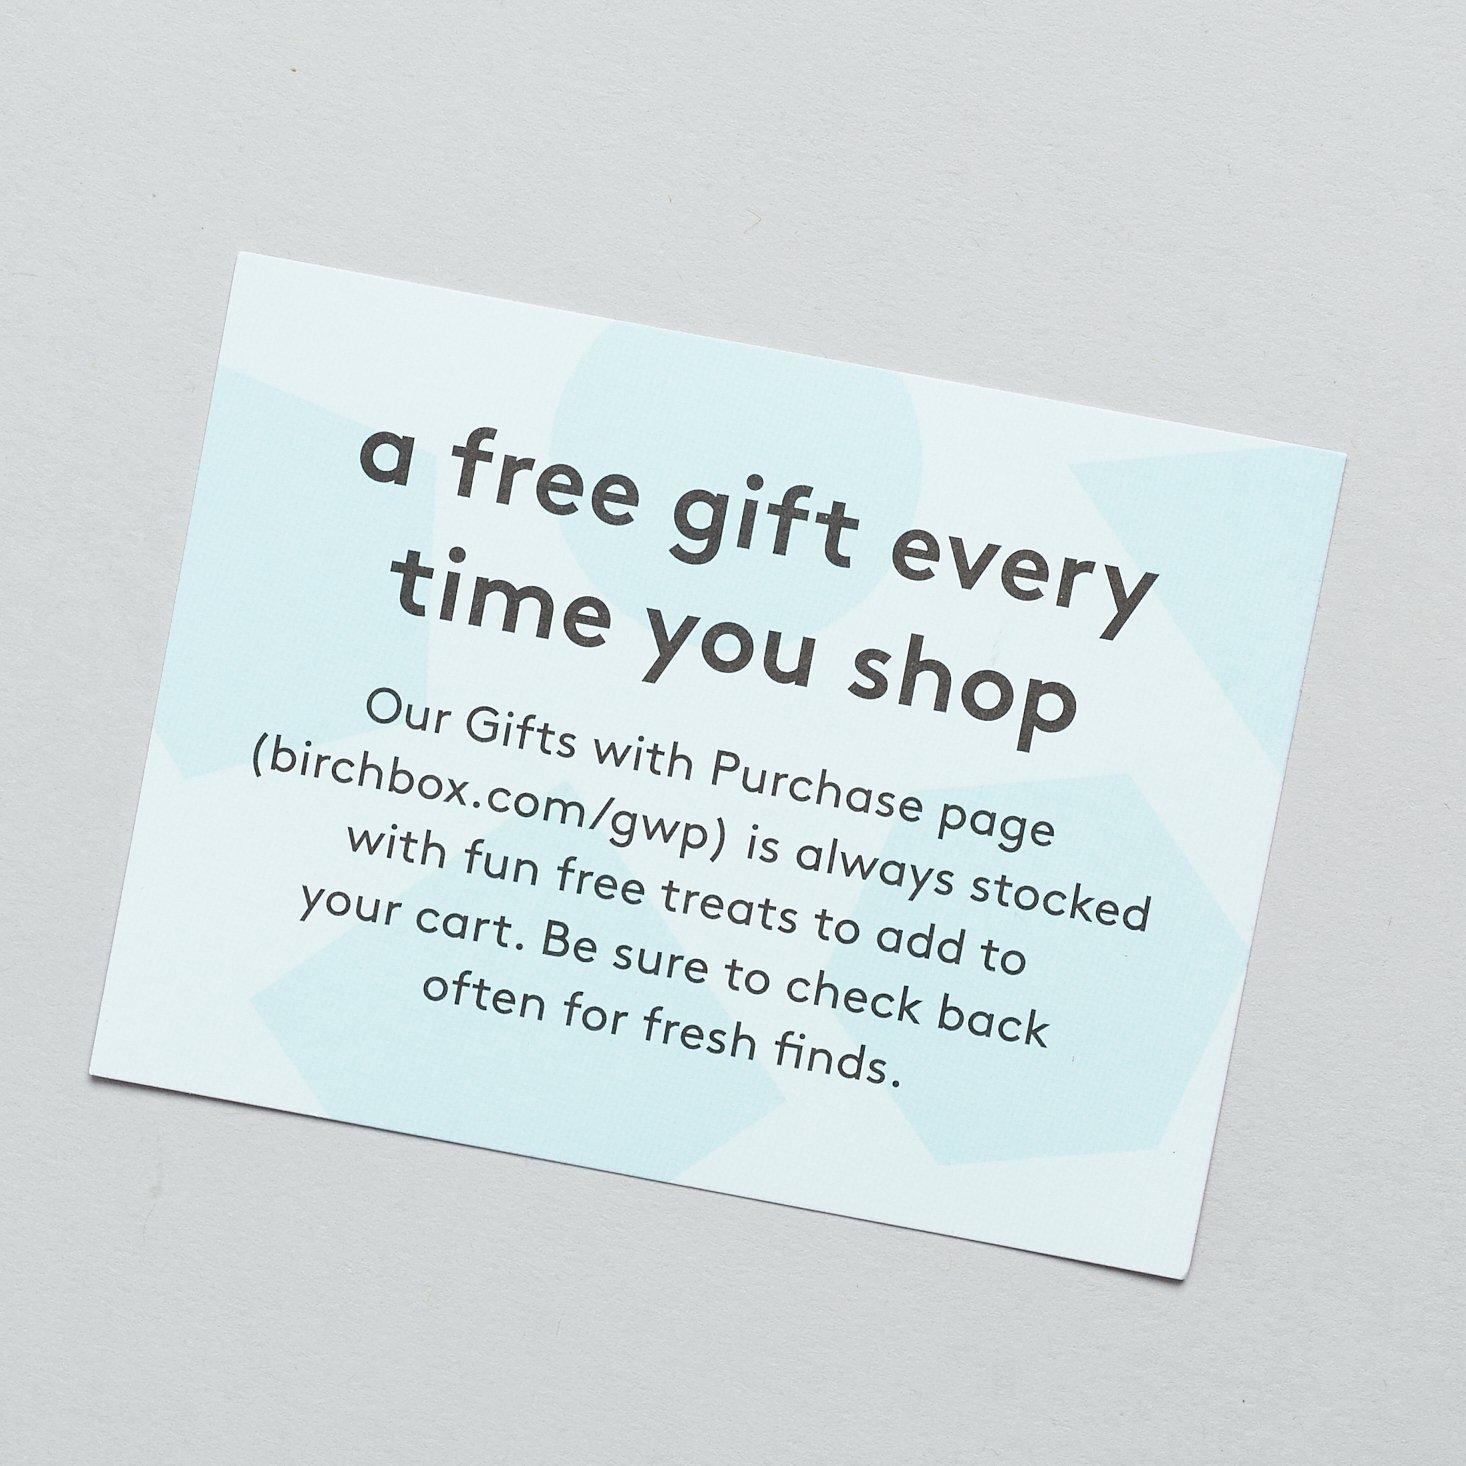 free gift promo card